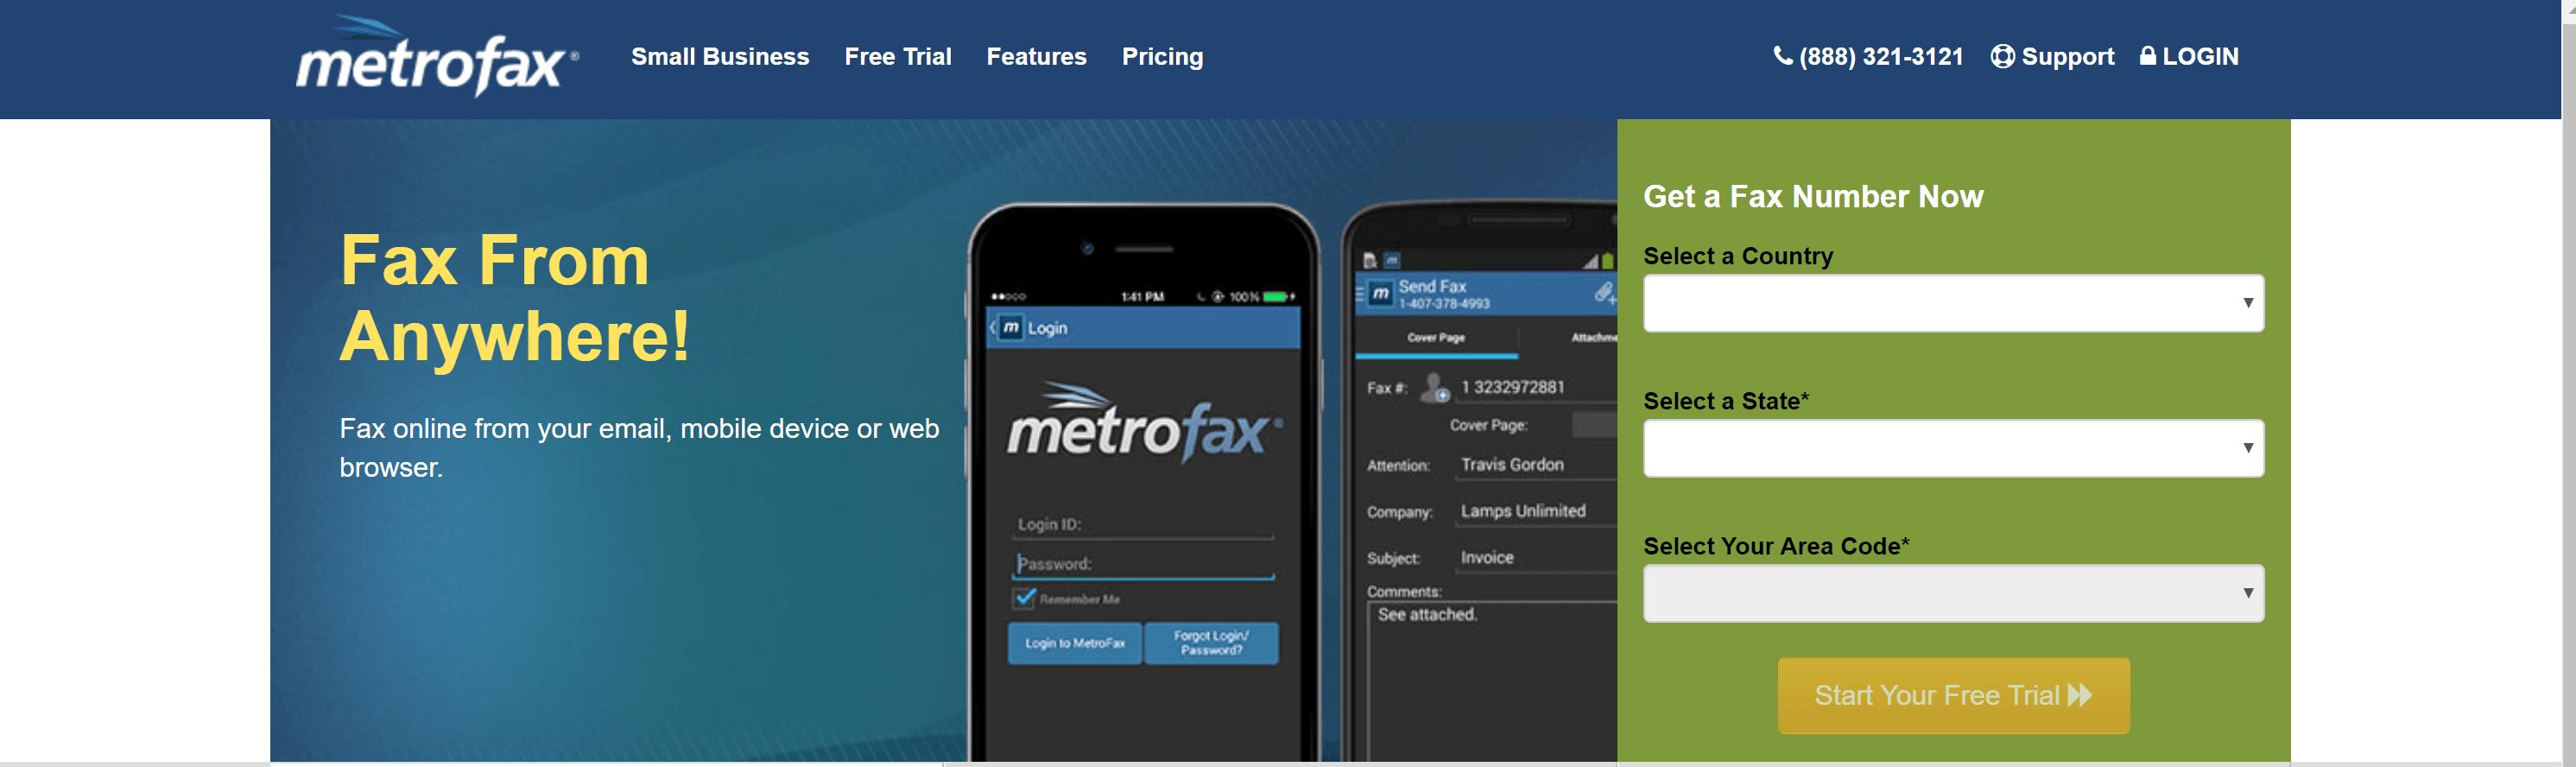 Metrofax reviews